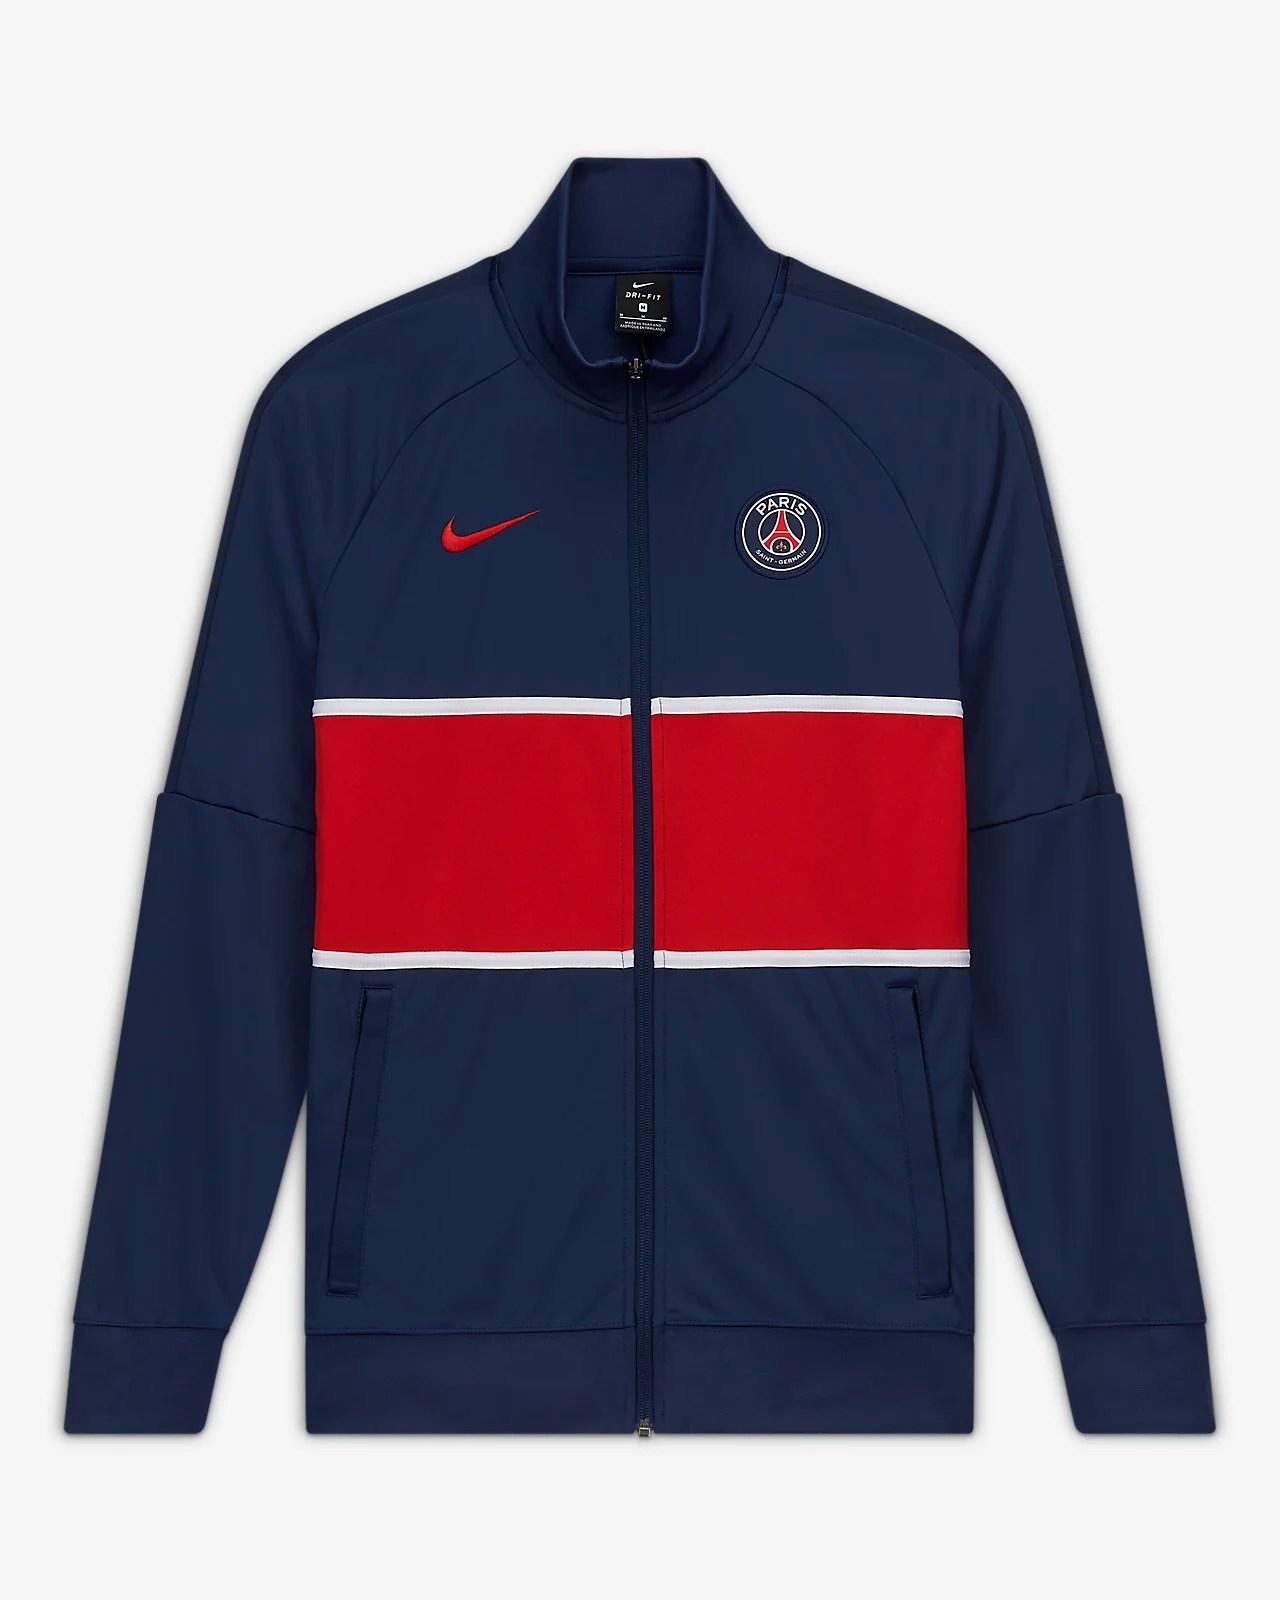 paris saint germain men s track jacket